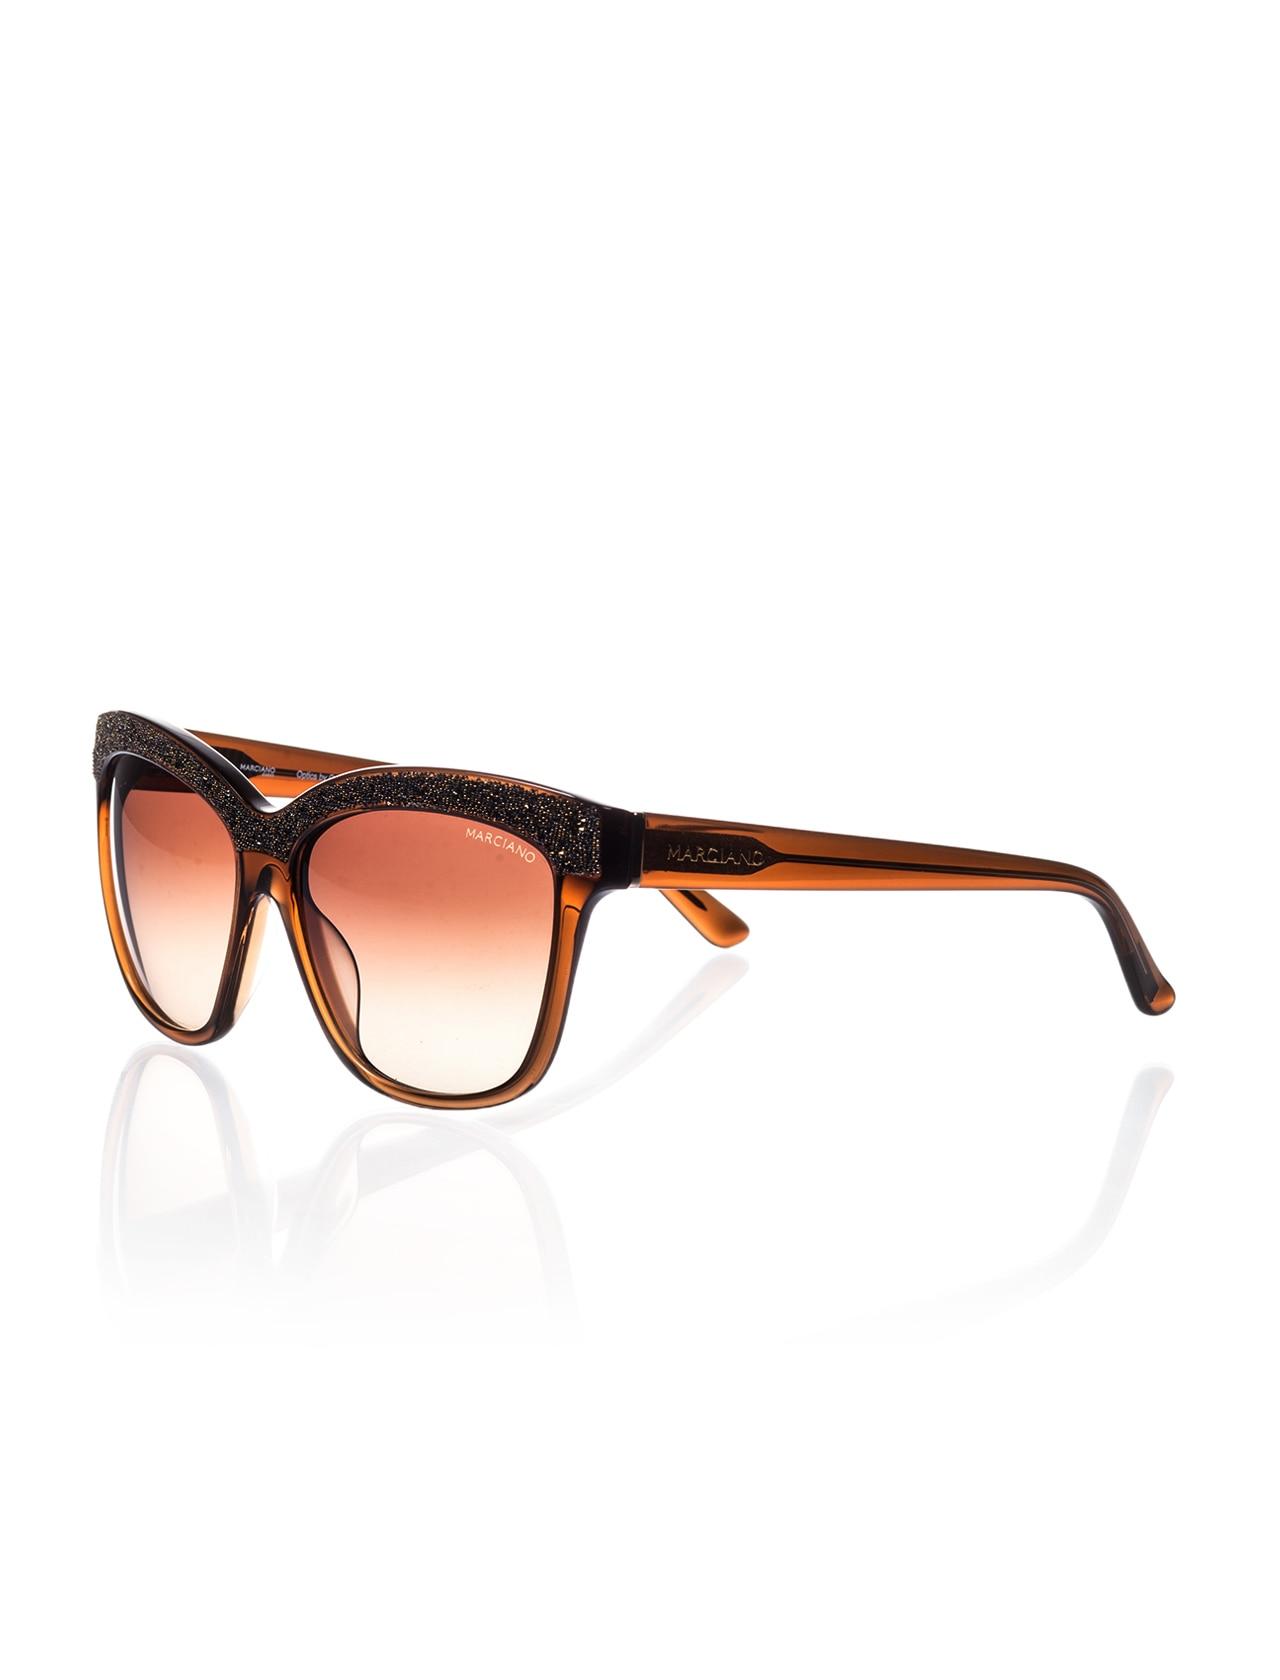 Women's sunglasses gm 729 50f bone Brown organic 57-guess by marcaino